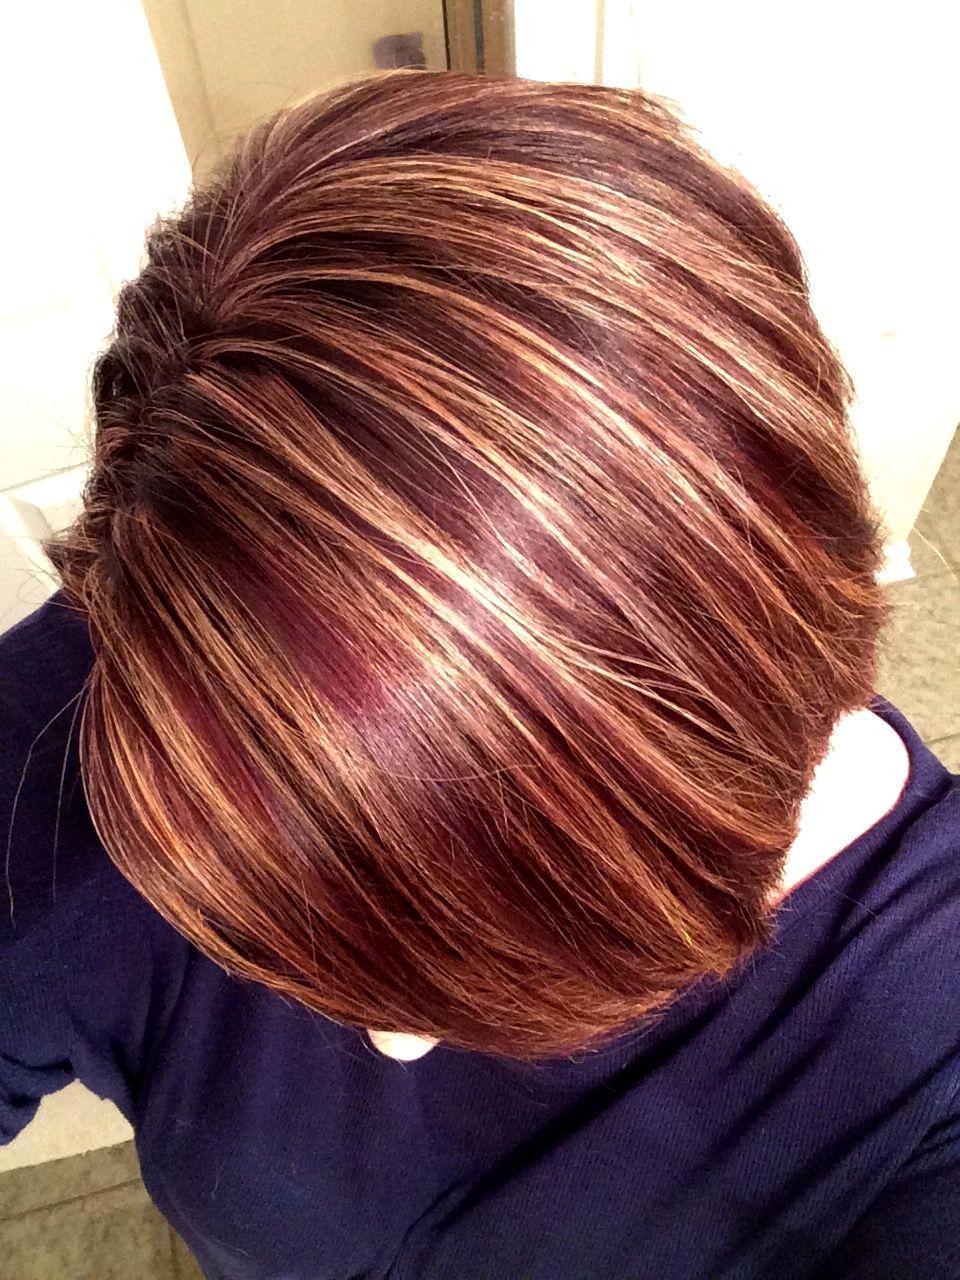 Hair Color Merlot Base With Blonde Highlights Merlot Hair